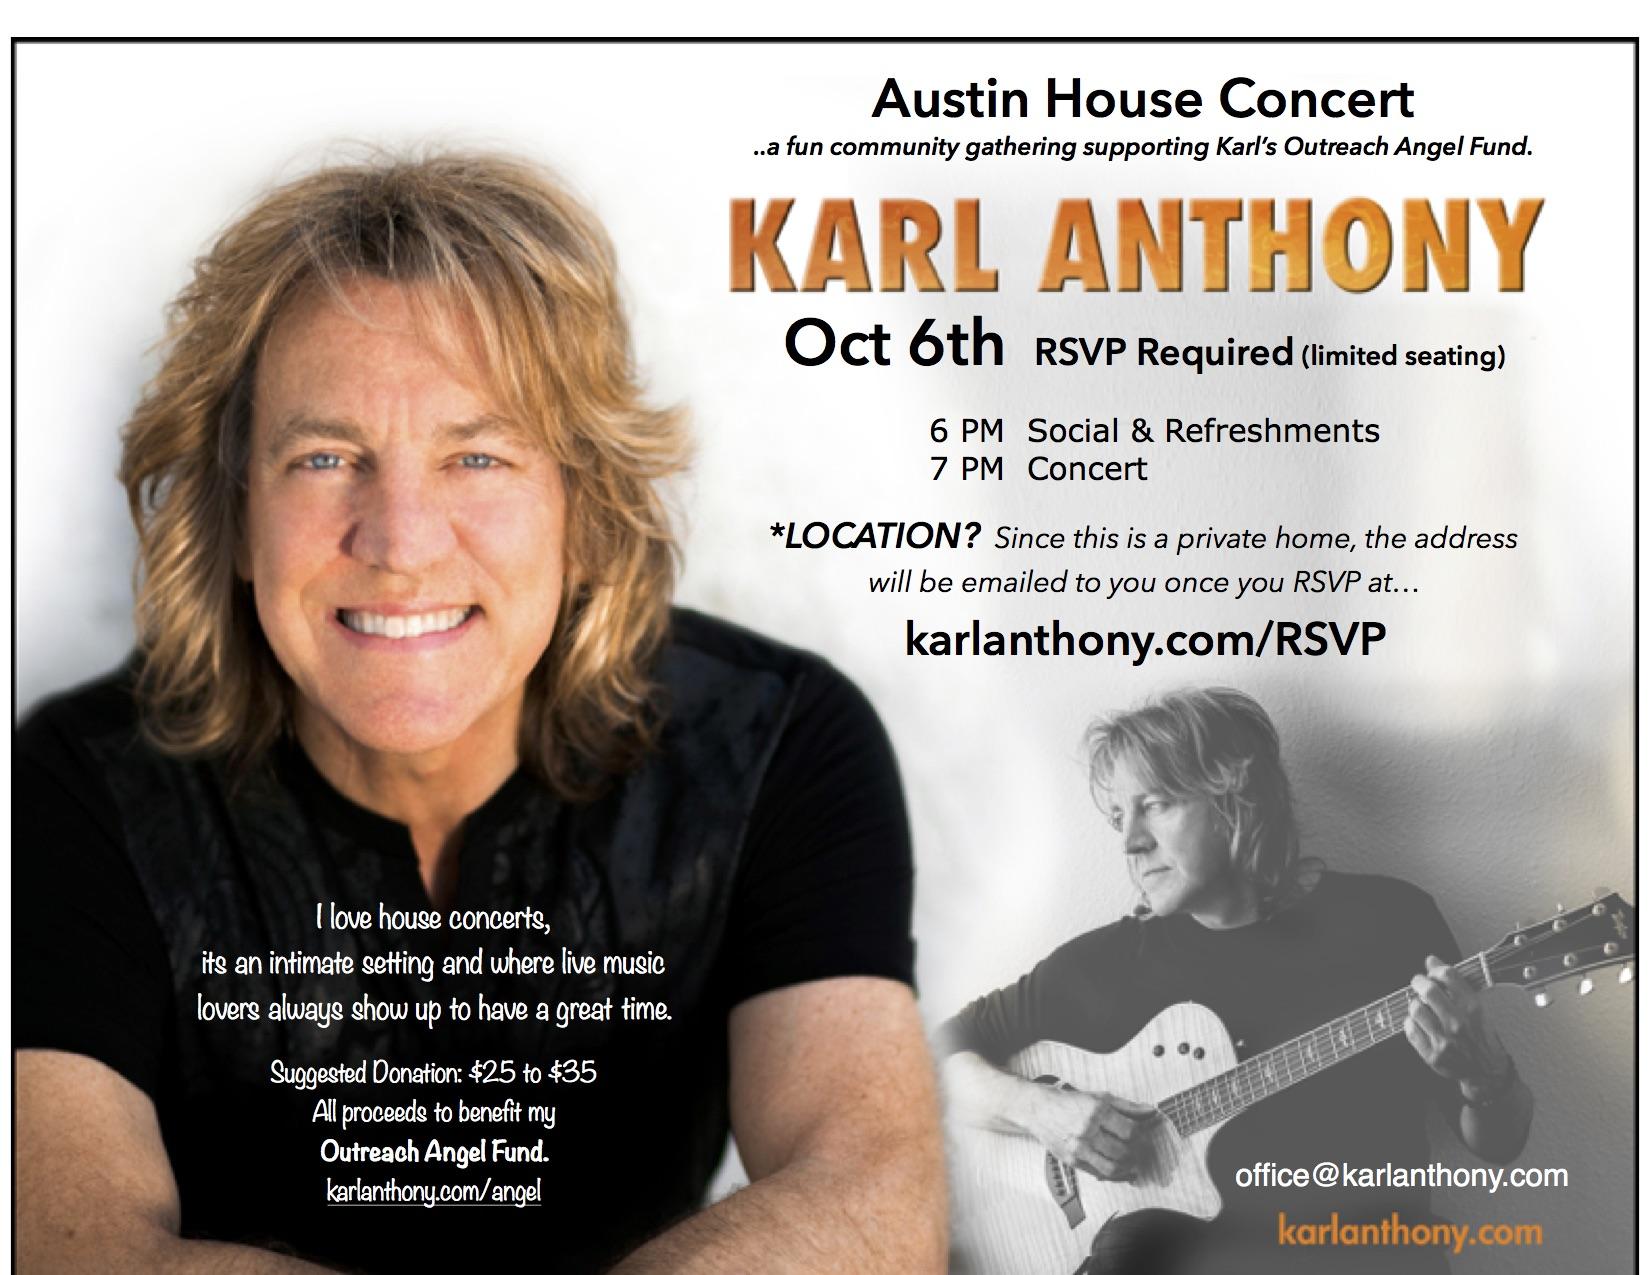 Austin House Concert - Oct 6th jpeg.jpg